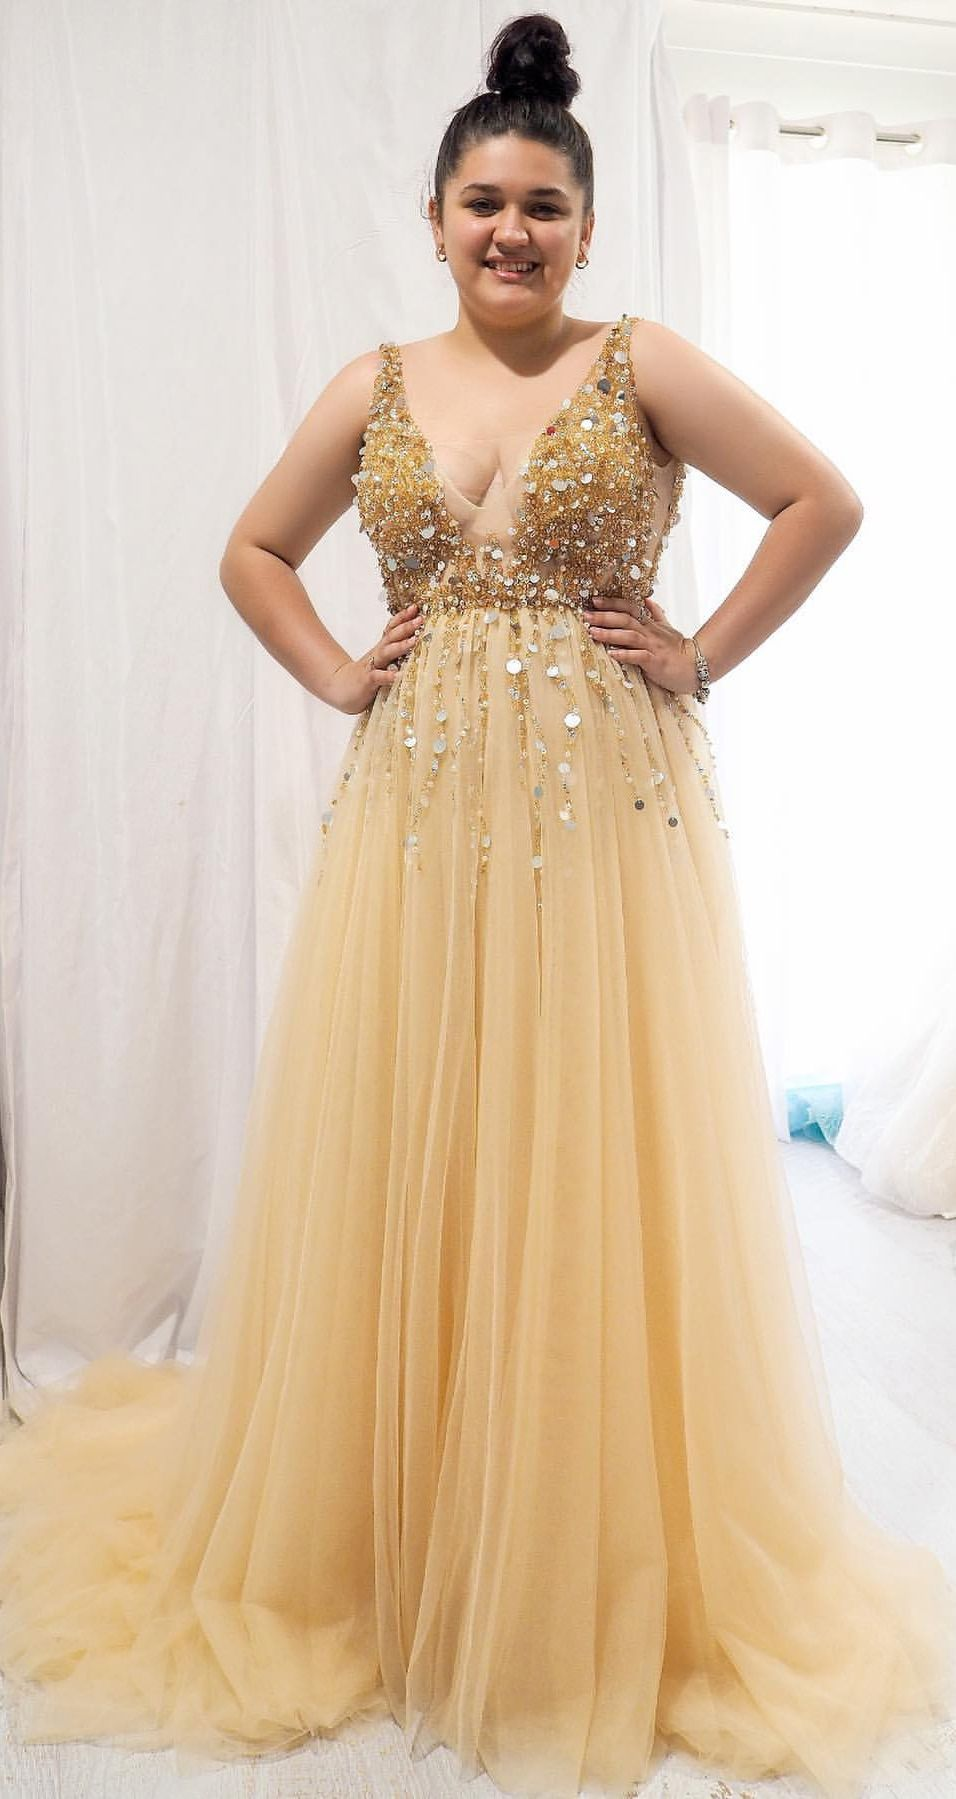 A Line V Neck Sequins Beaded Gold Long Prom Dresses Plus Size Evening Gown Po188 Plus Size Evening Gown Prom Dresses Prom Dresses Long [ 1799 x 956 Pixel ]